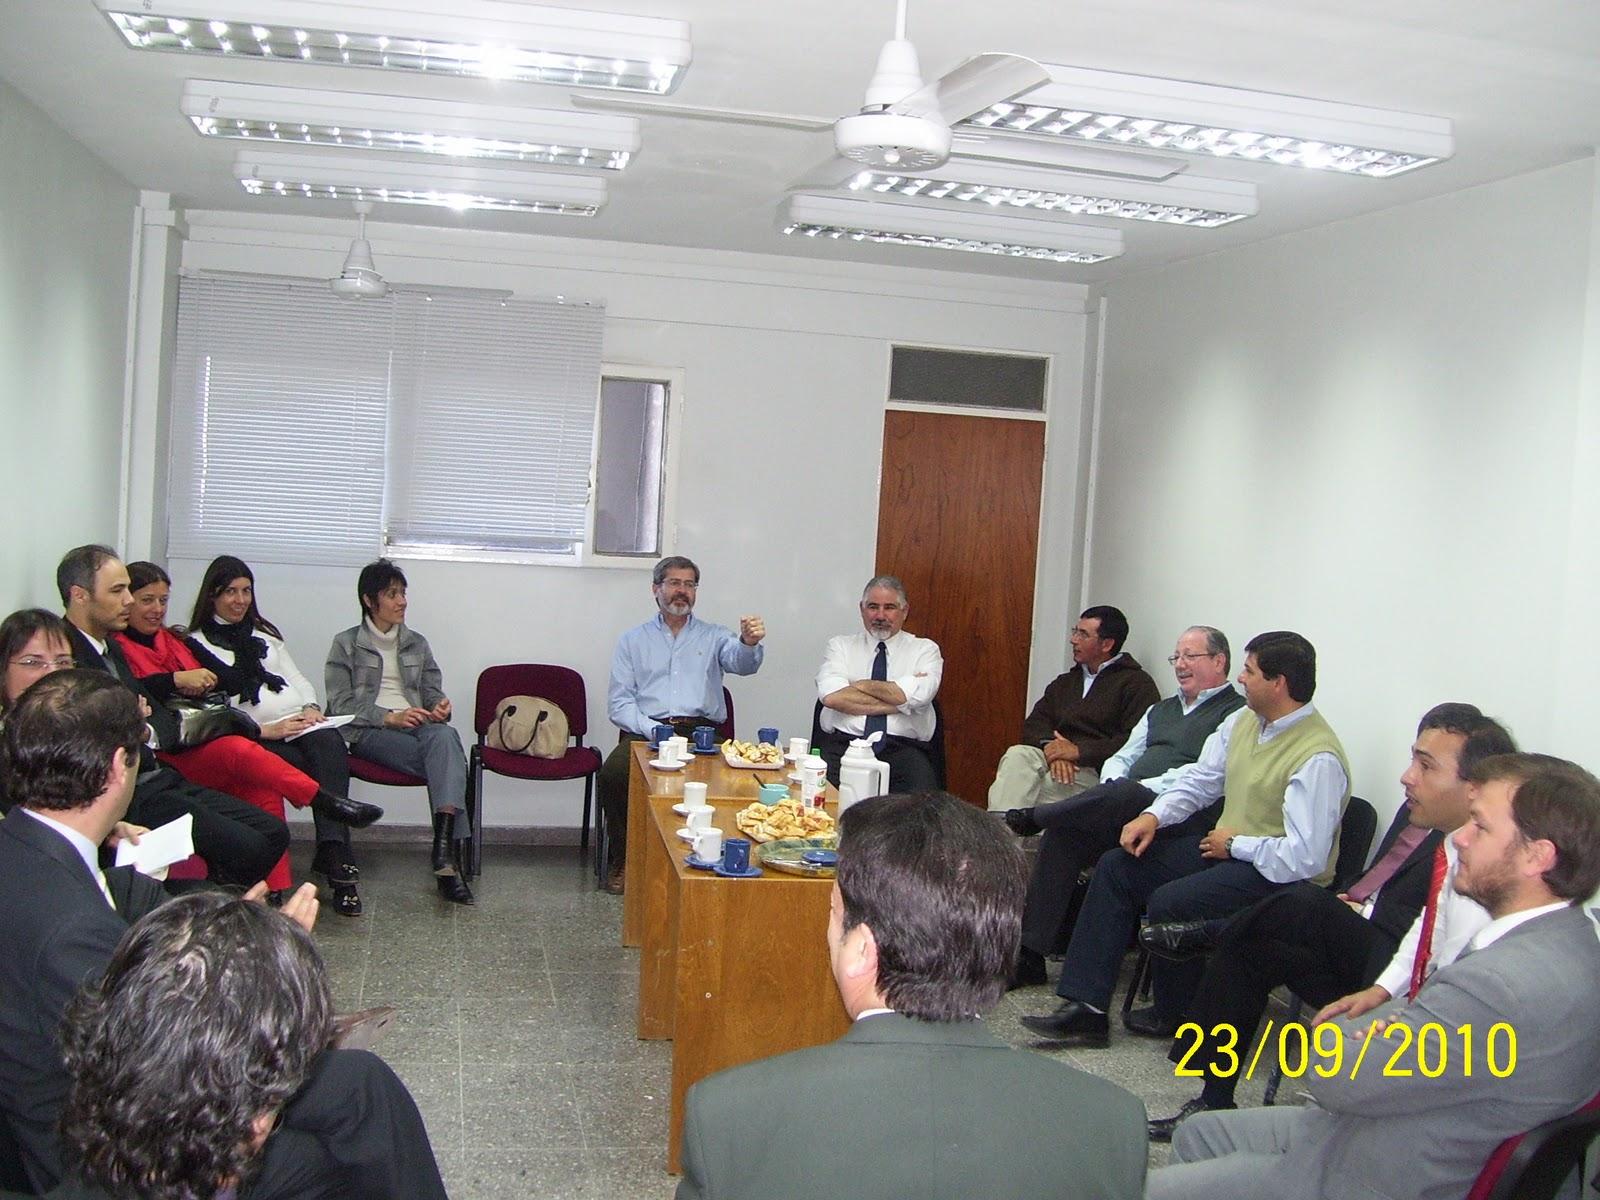 Oficina judicial trelew 2010 for Oficina judicial